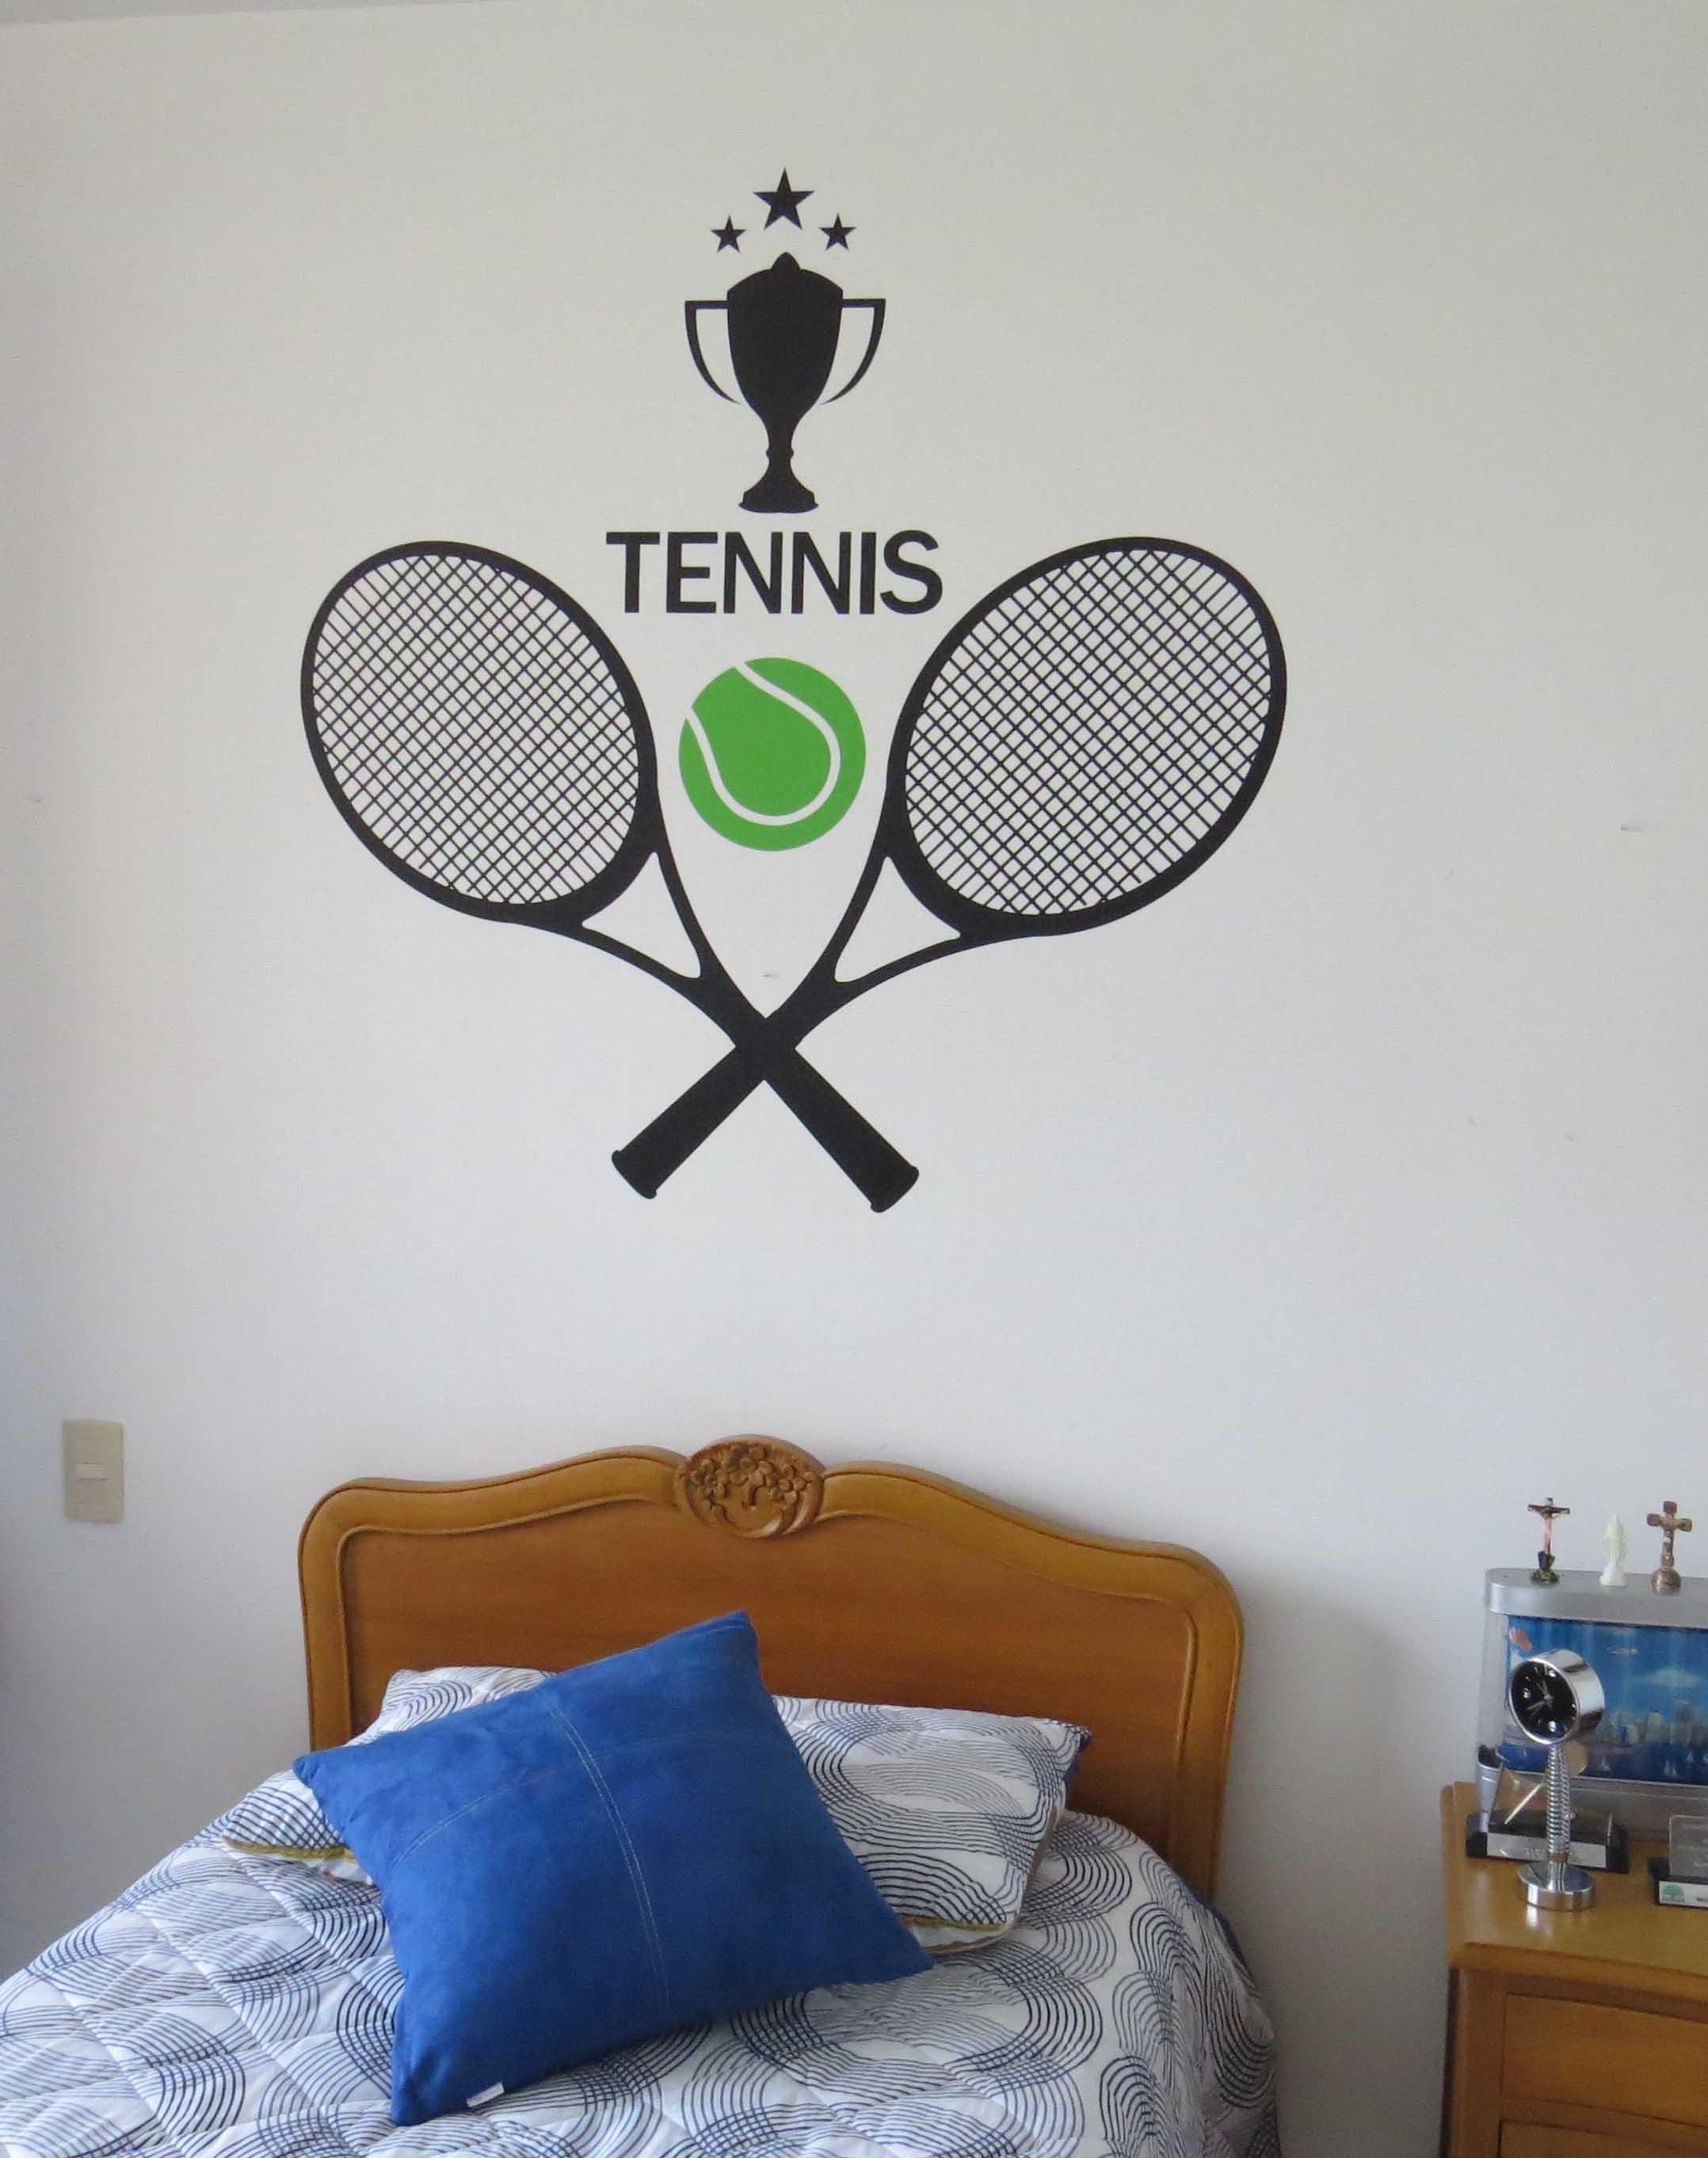 Vinilo Decorativo Tennis